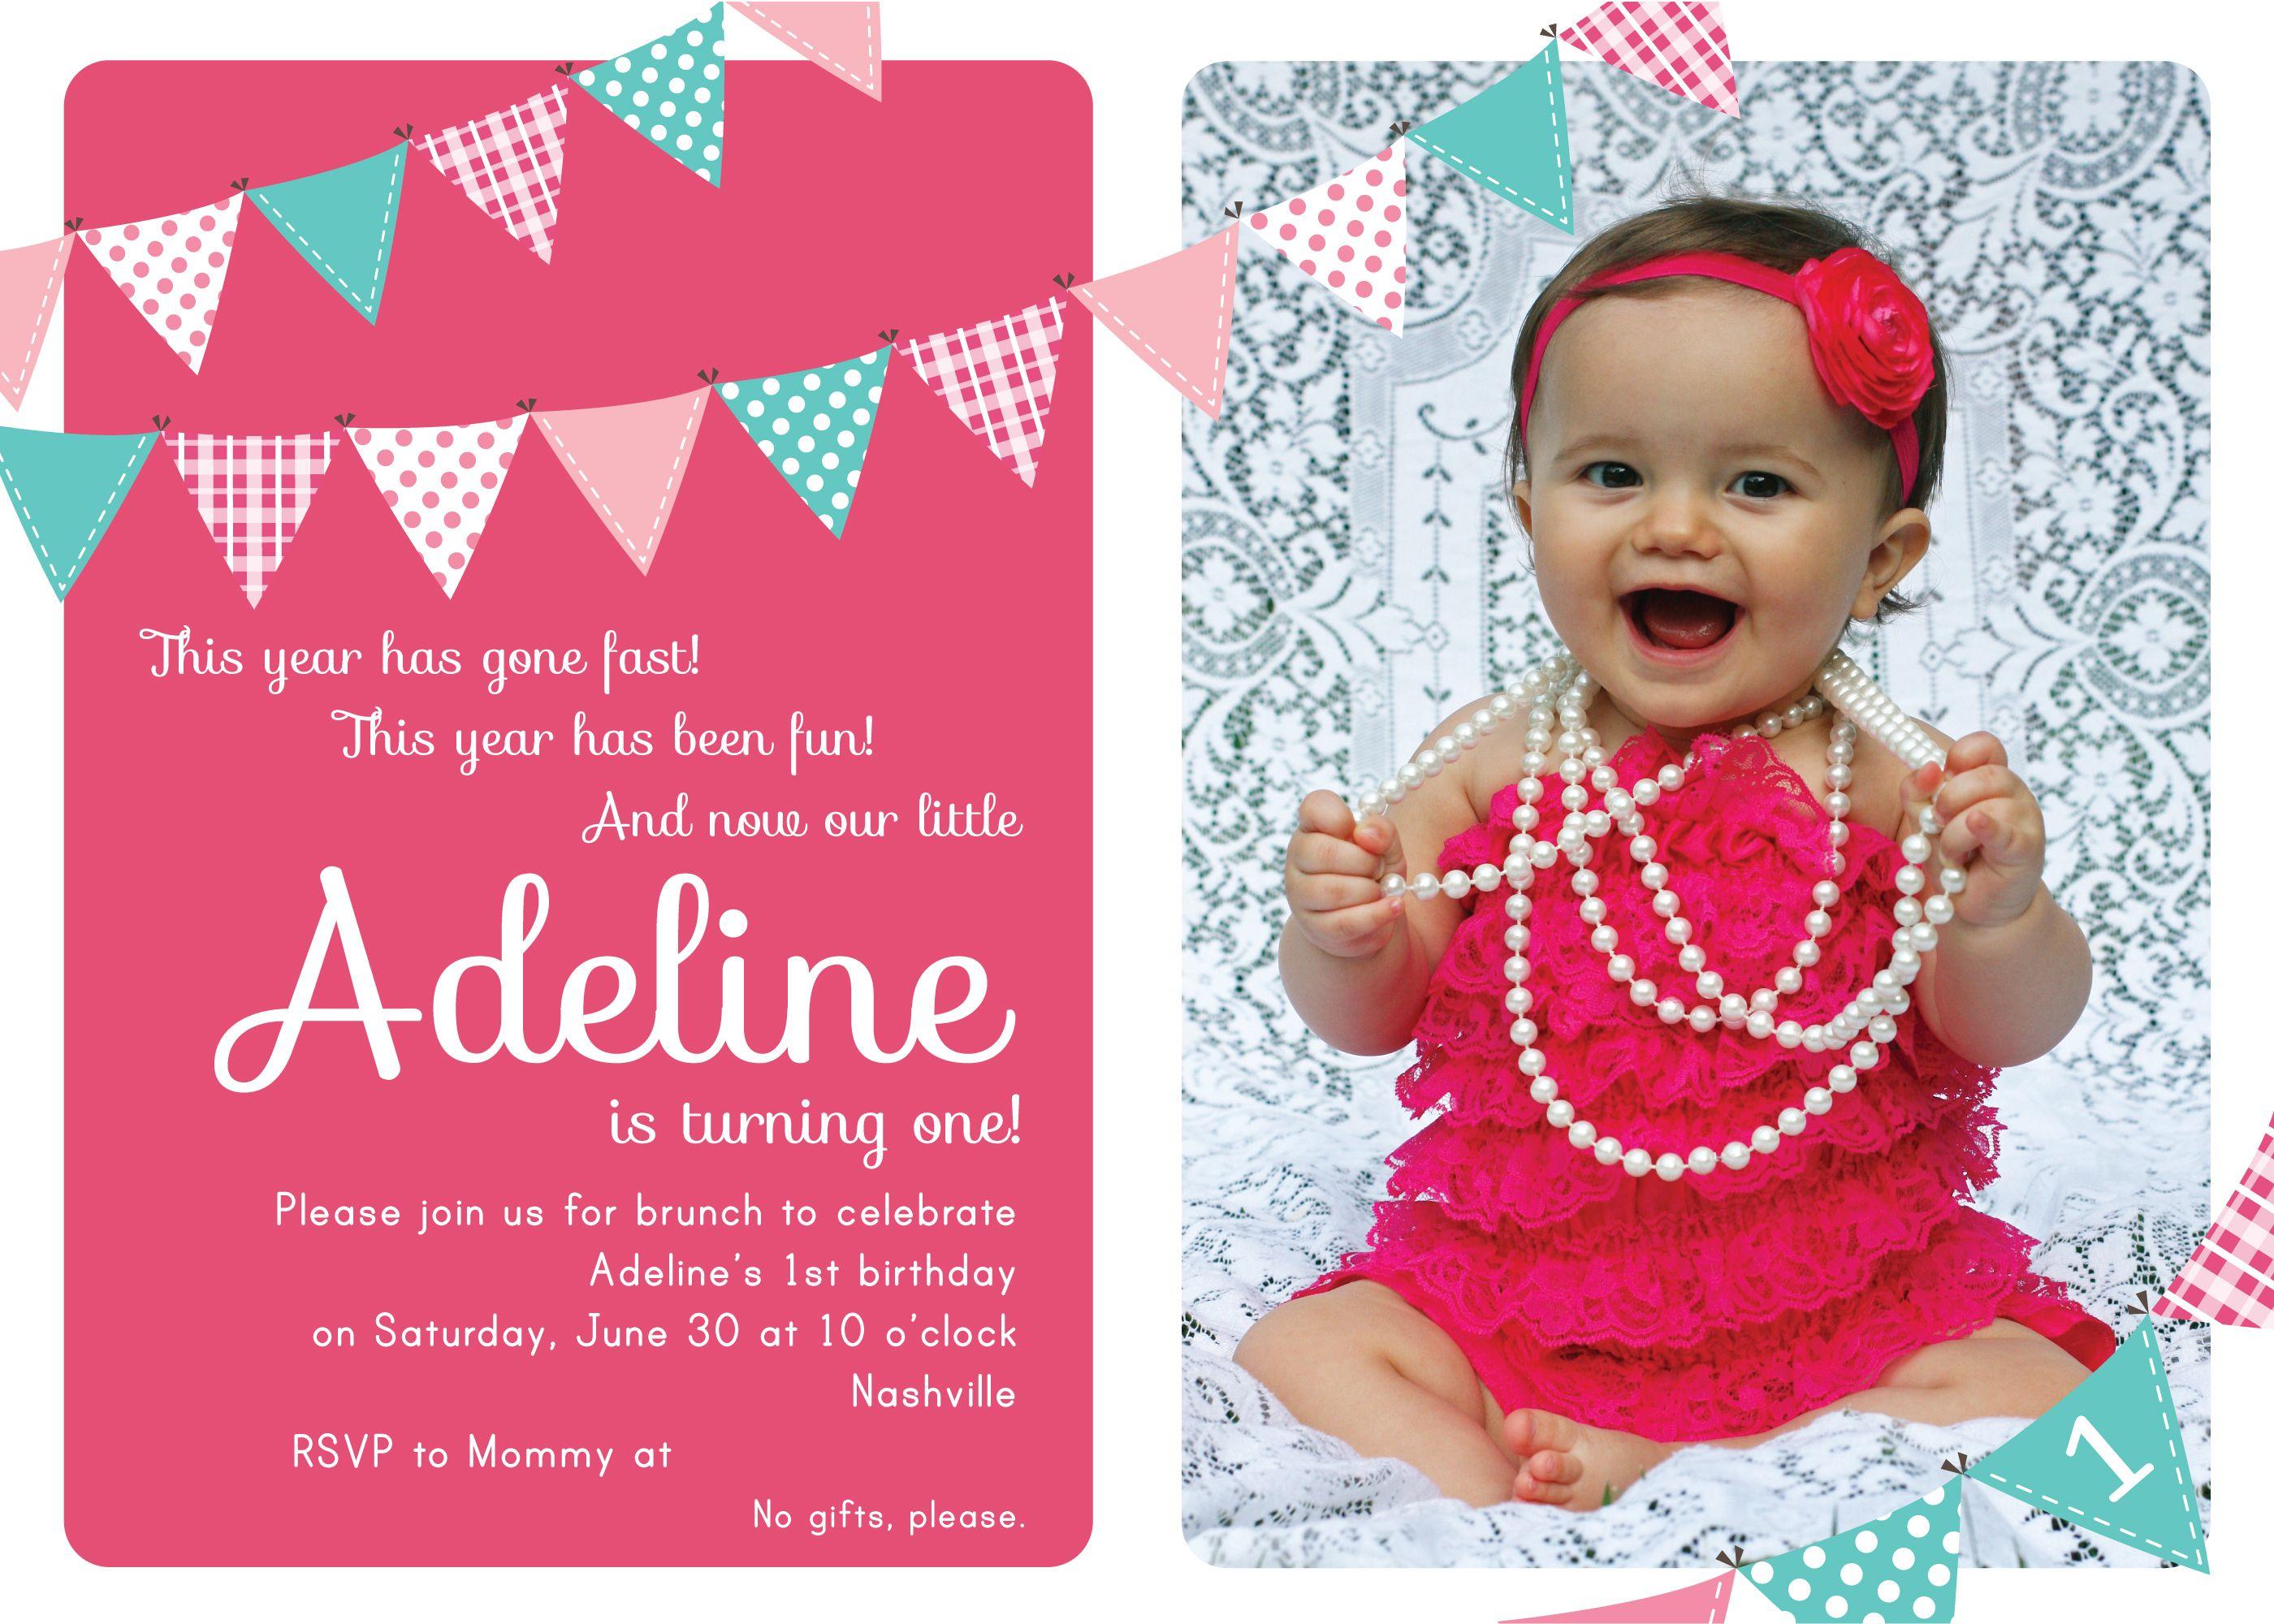 First Birthday Invitations Girl Ideas Check More At Http Www Owninvitat Birthday Invitation Card Template Cheap Birthday Invitations 1st Birthday Invitations